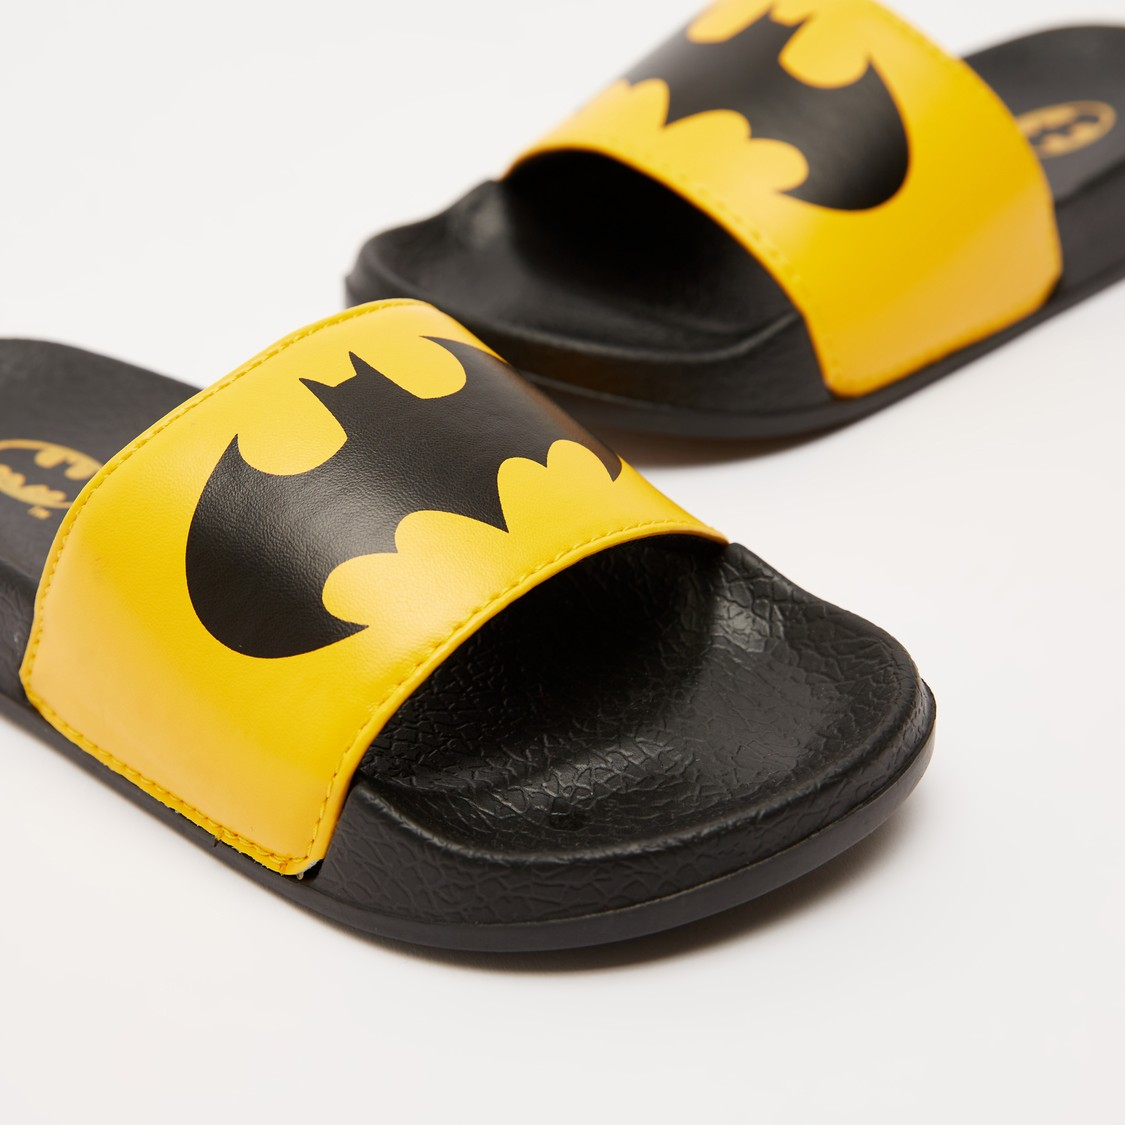 Batman Print Slides and Textured Footbed